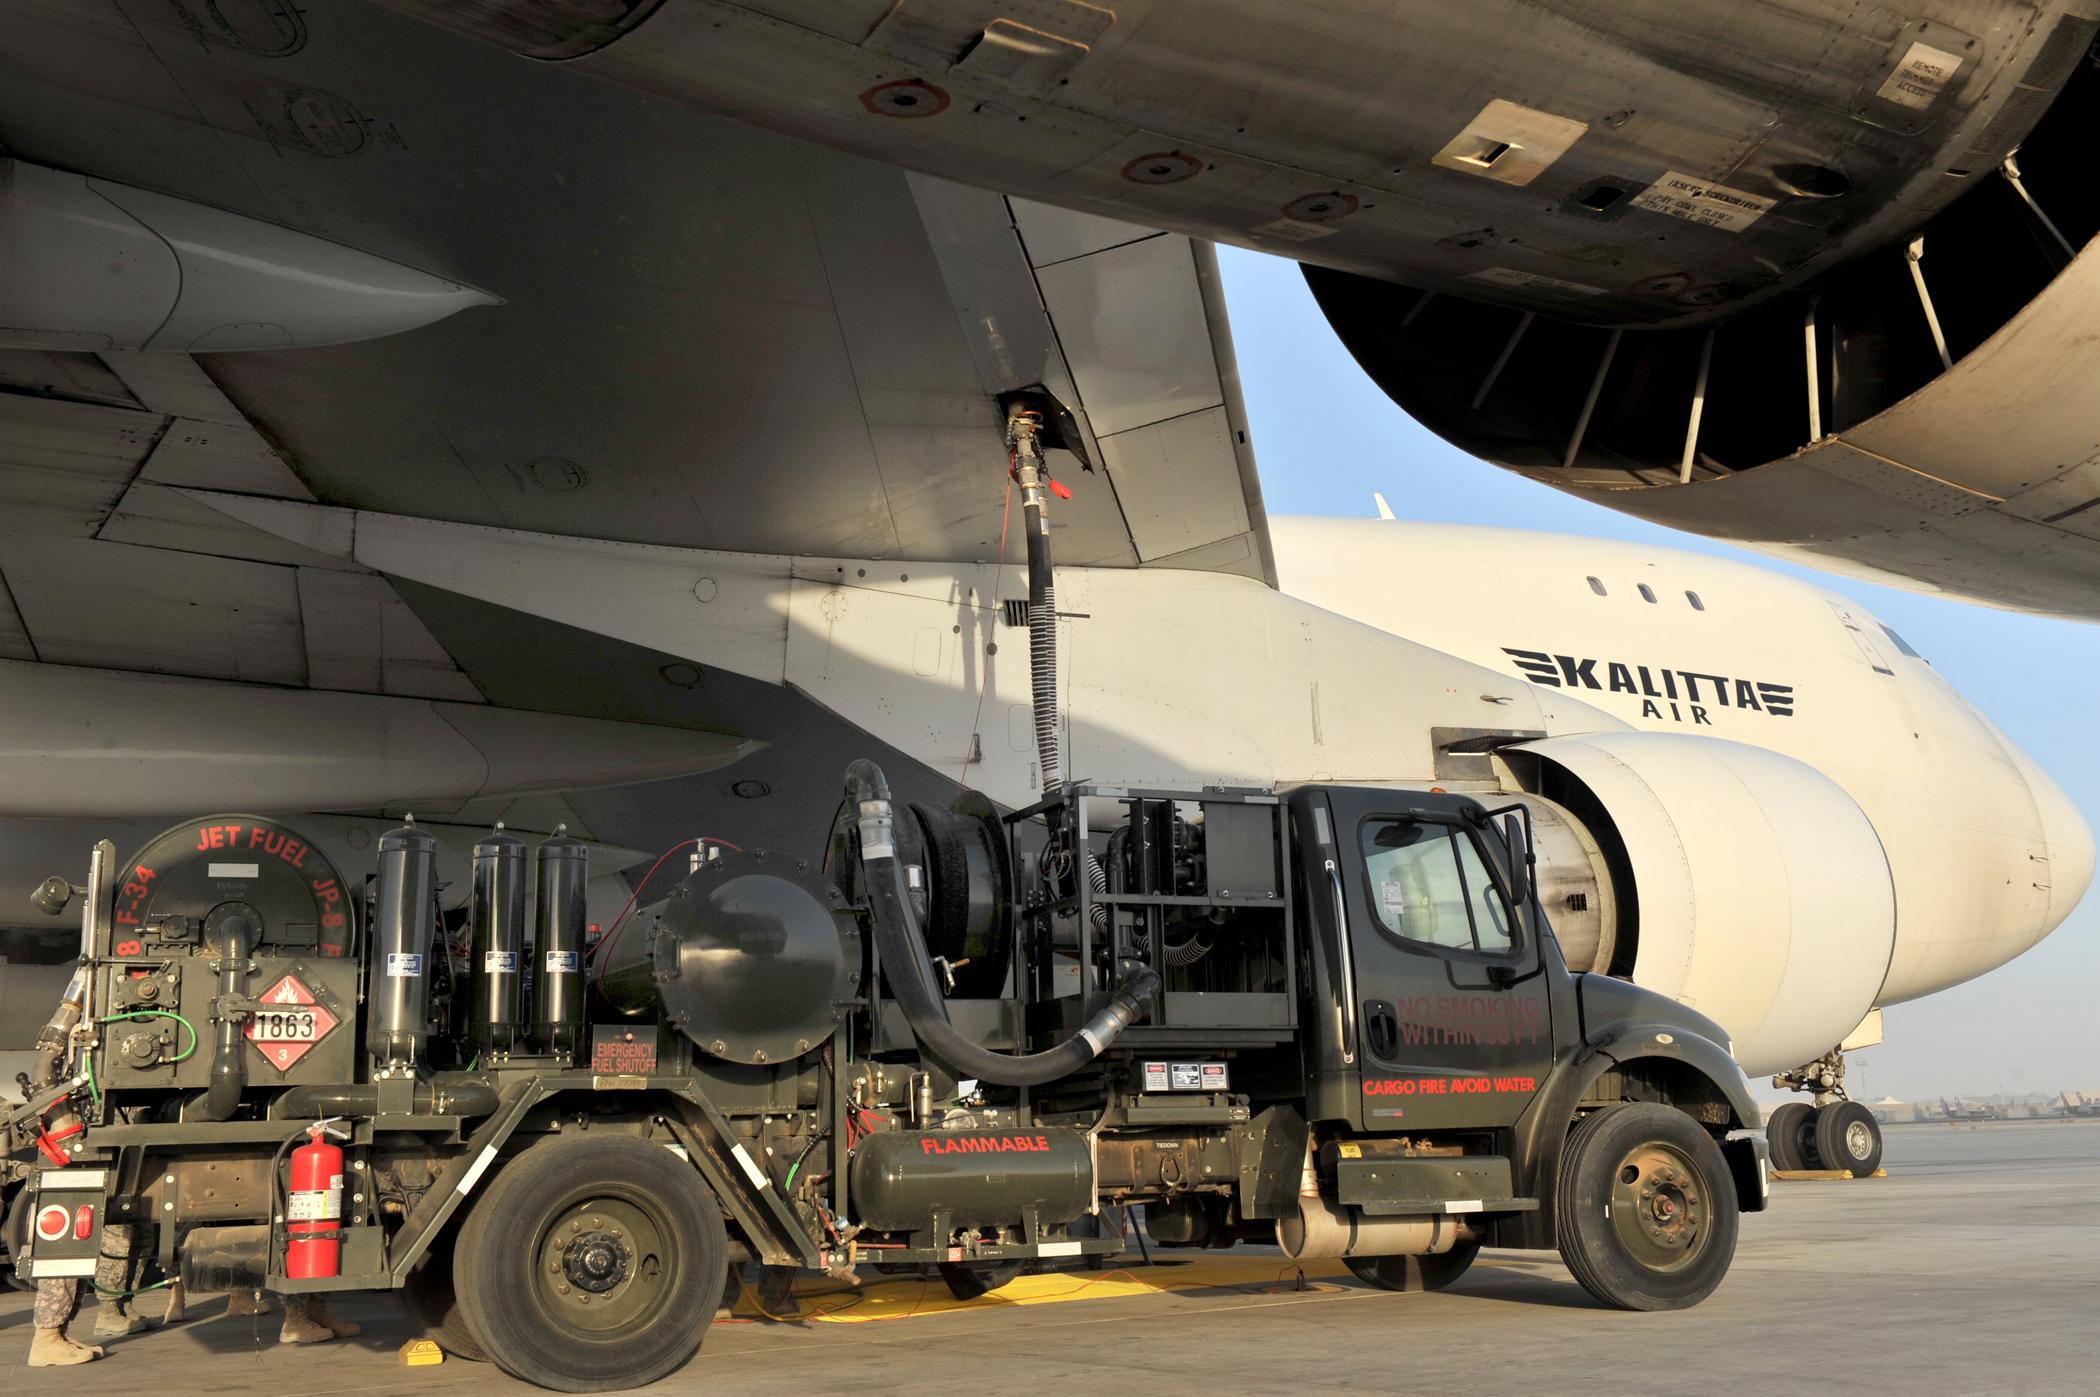 New Fuel System Enhances Bagram S Refueling Capabilities